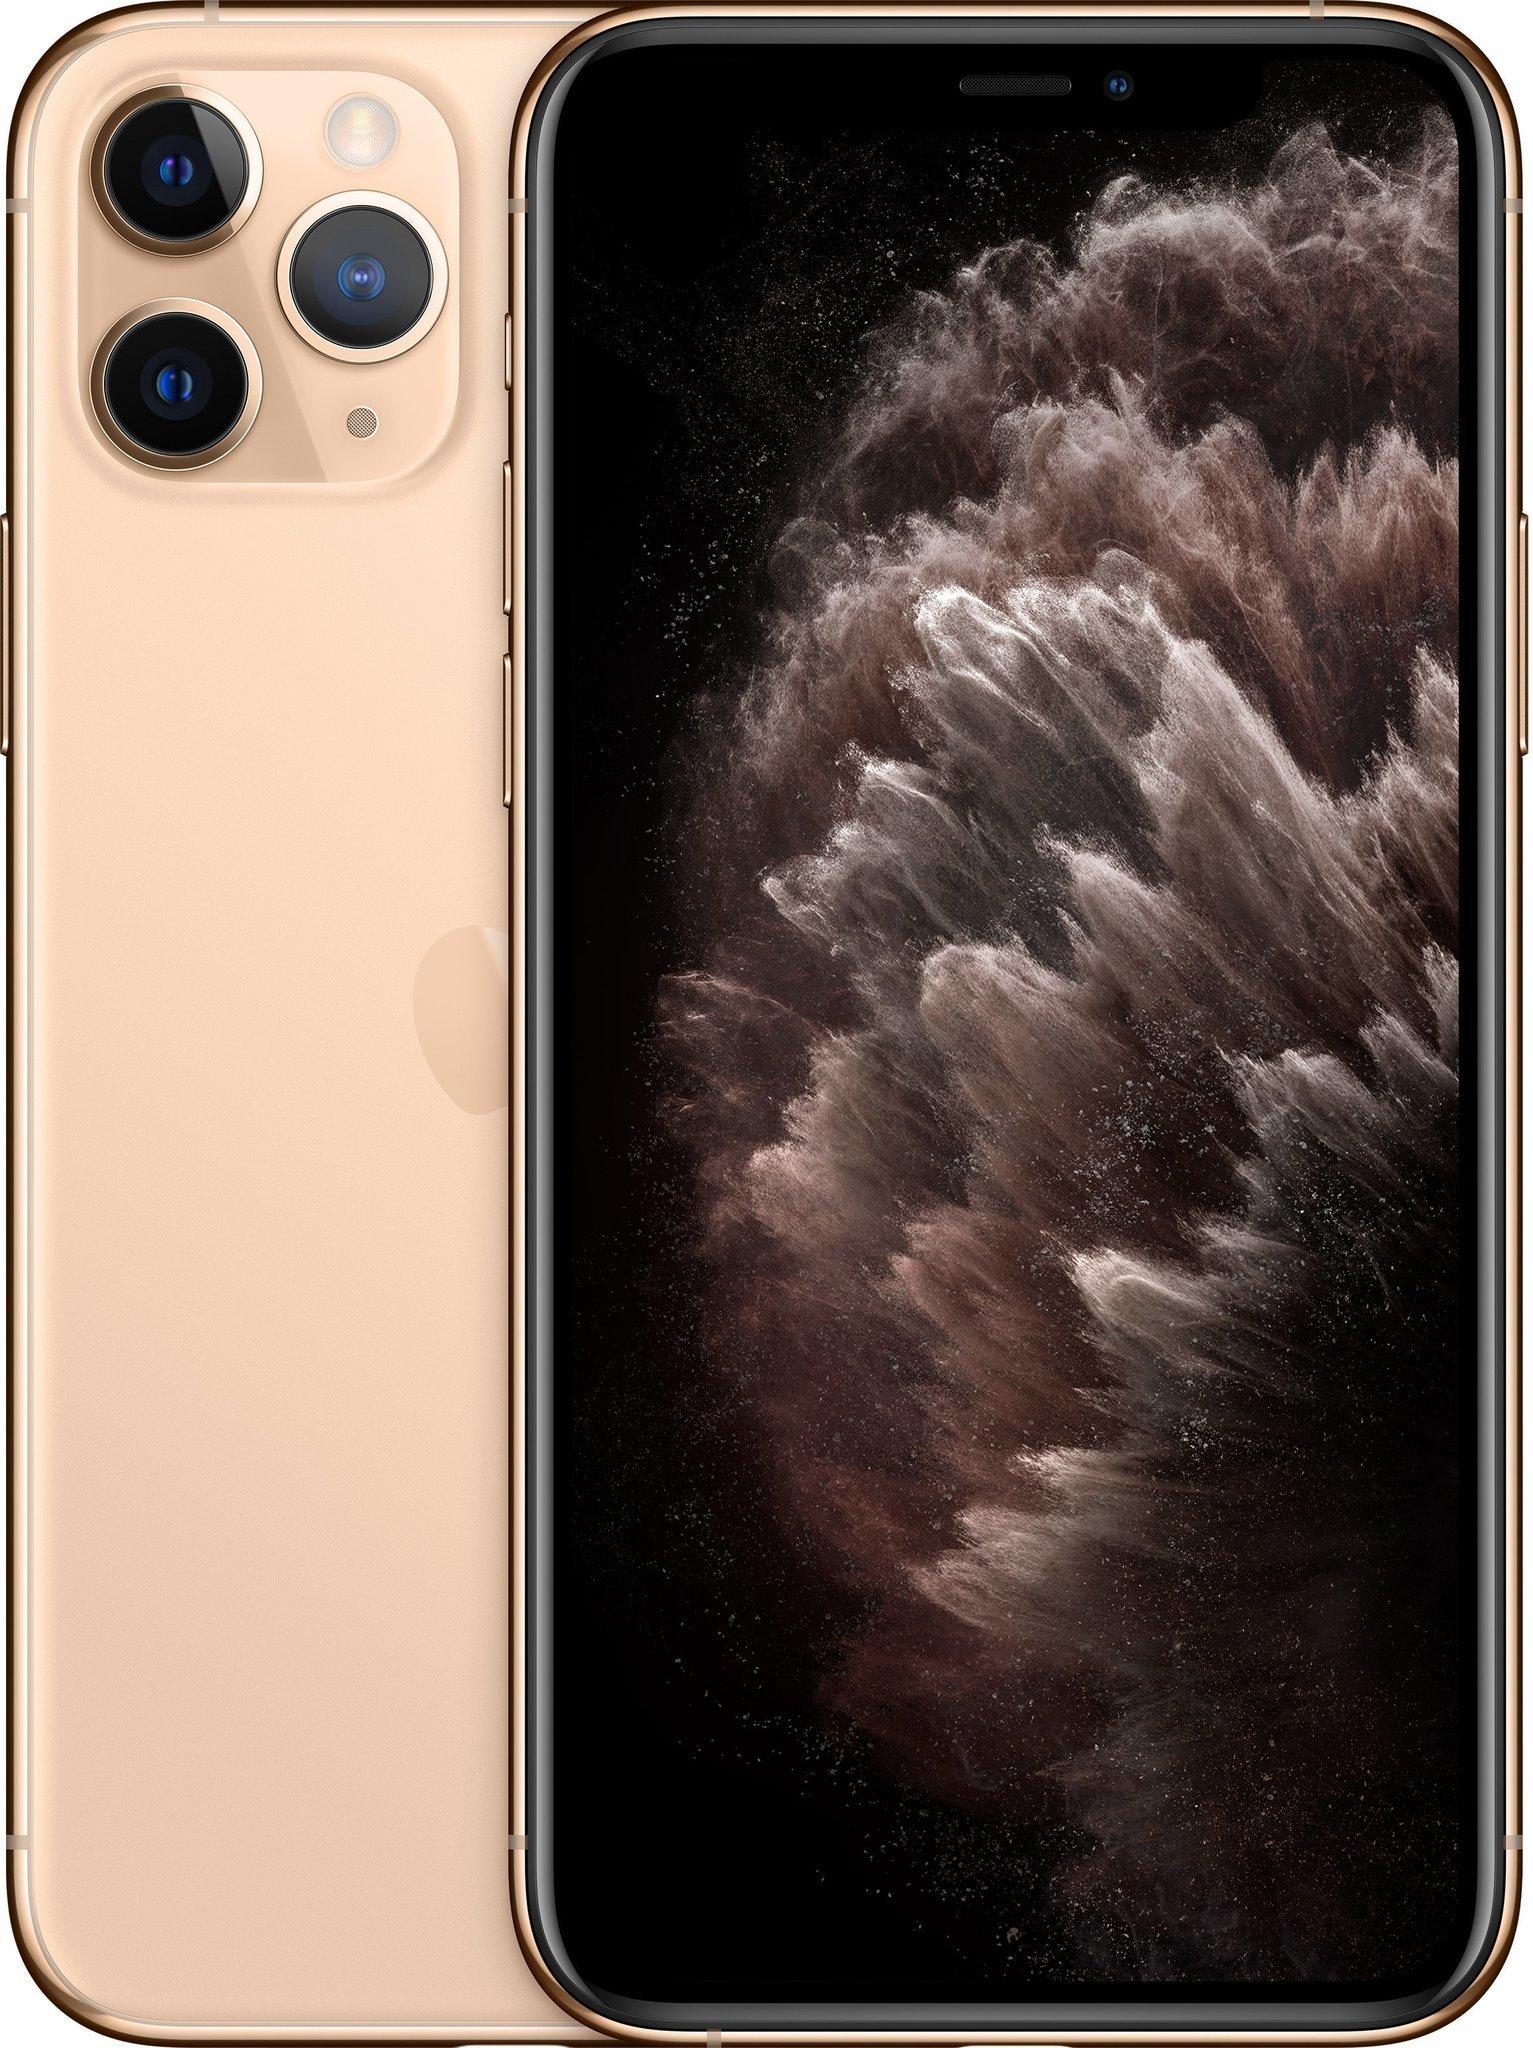 iPhone 11 Pro Max Apple iPhone 11 Pro Max 256gb Золотой gold1.jpg